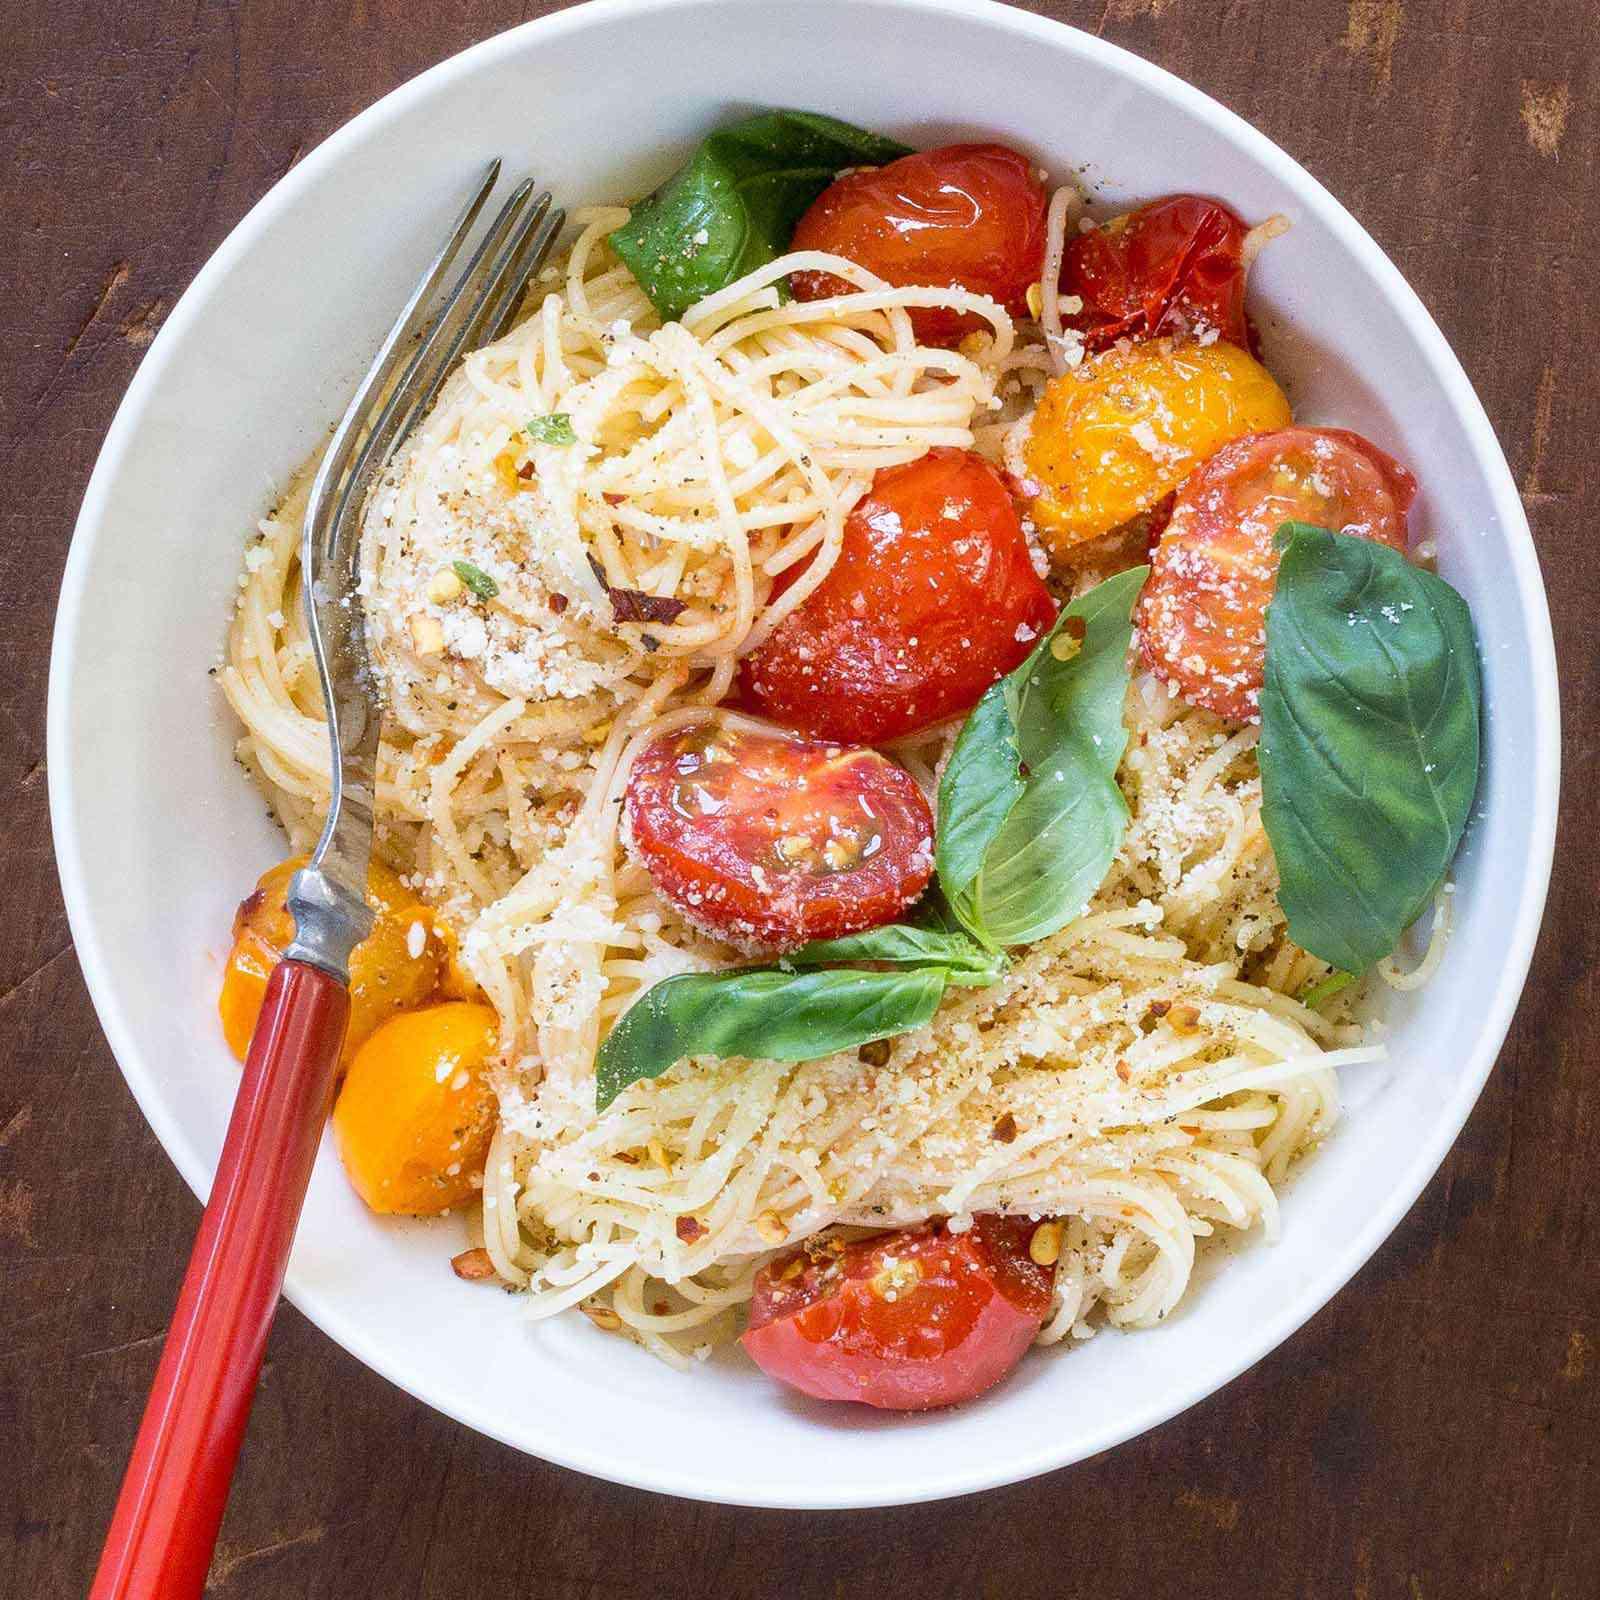 Angel Hair Pasta with Quick Cherry Tomato Sauce